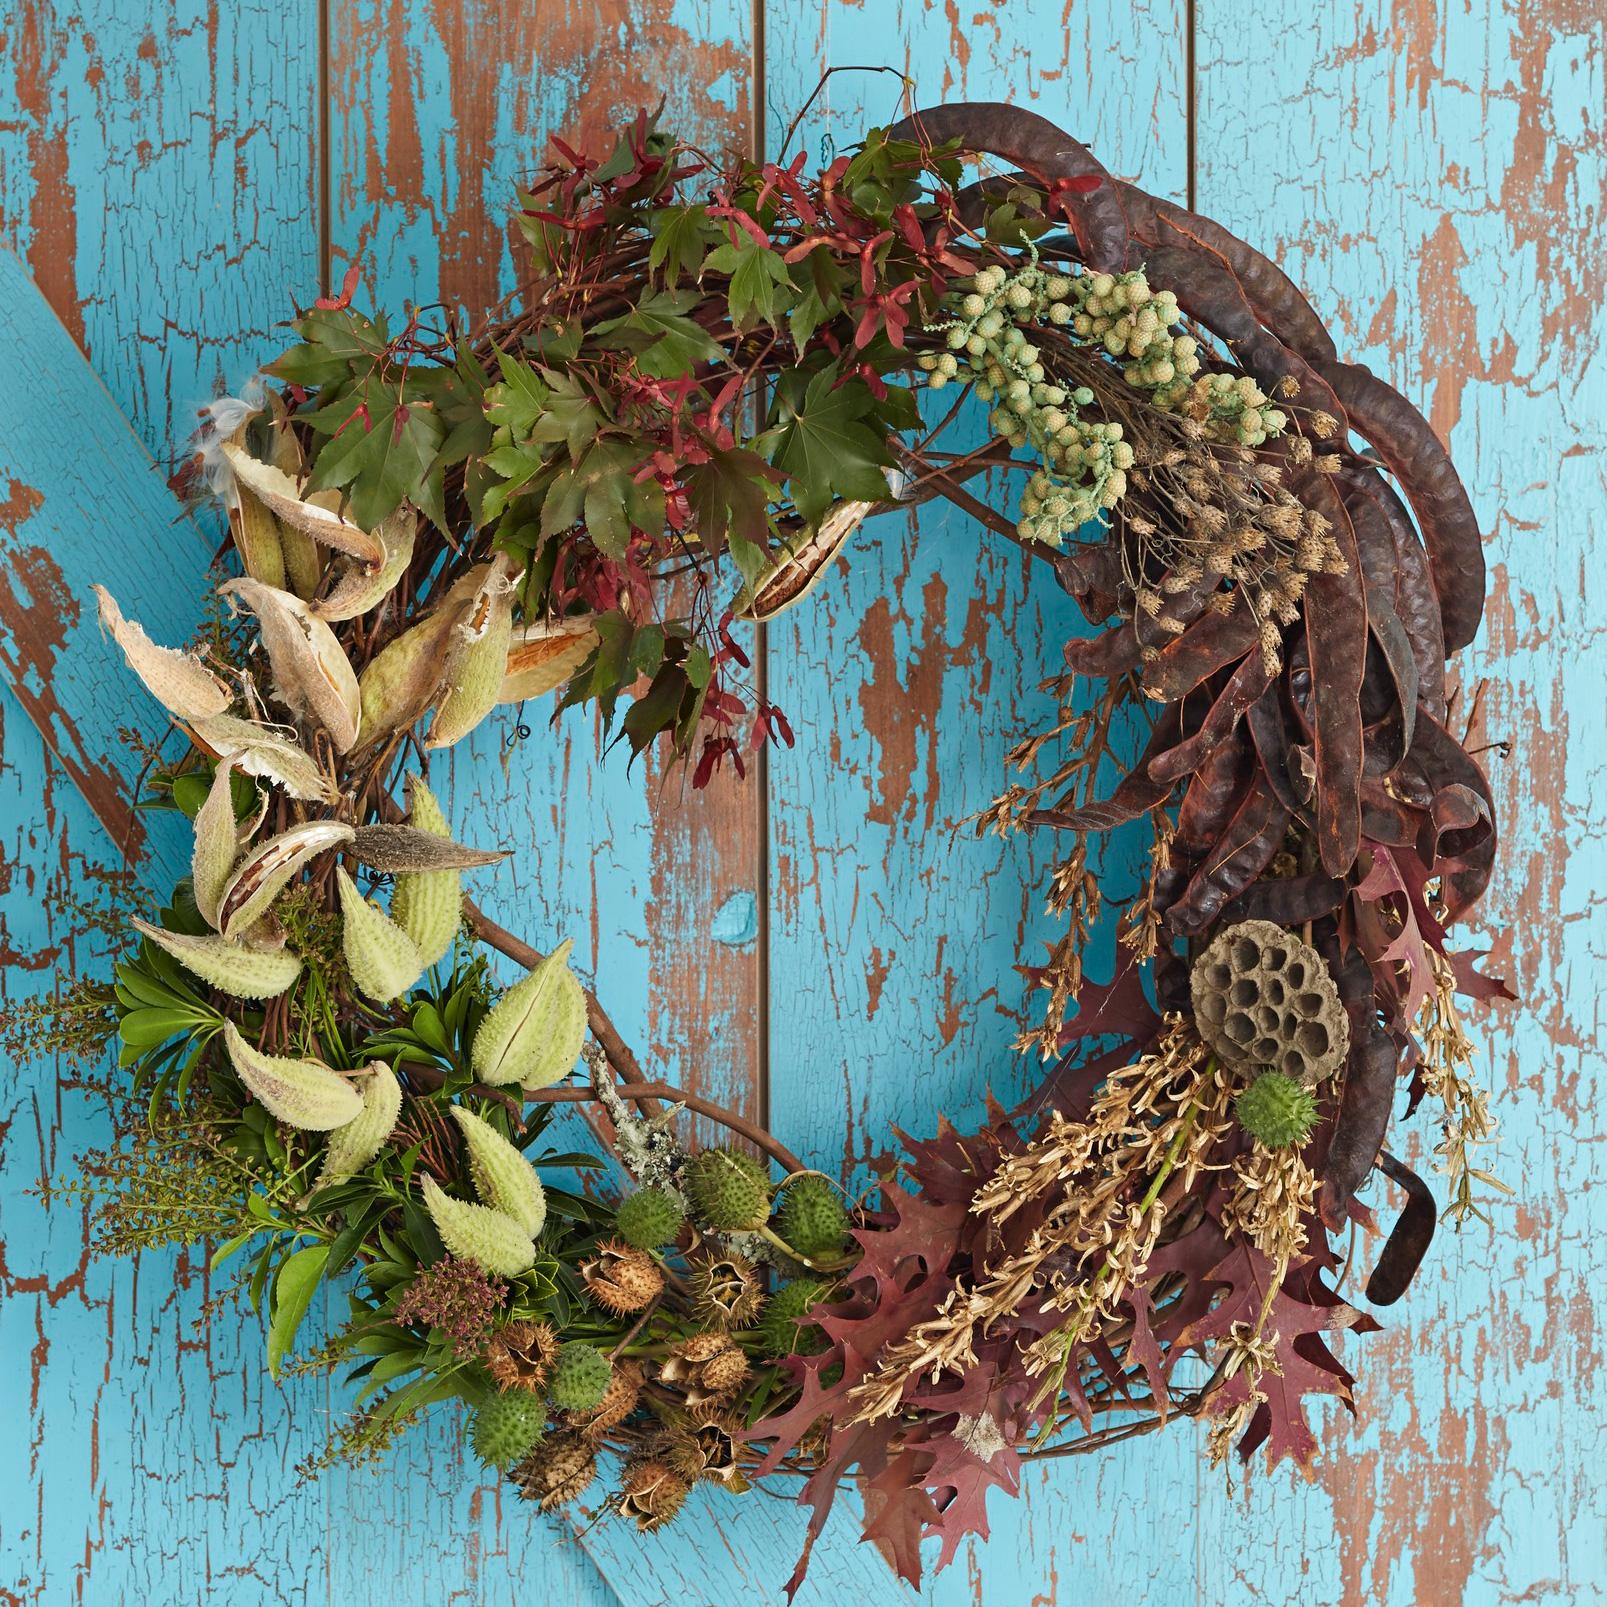 Seedpod wreath